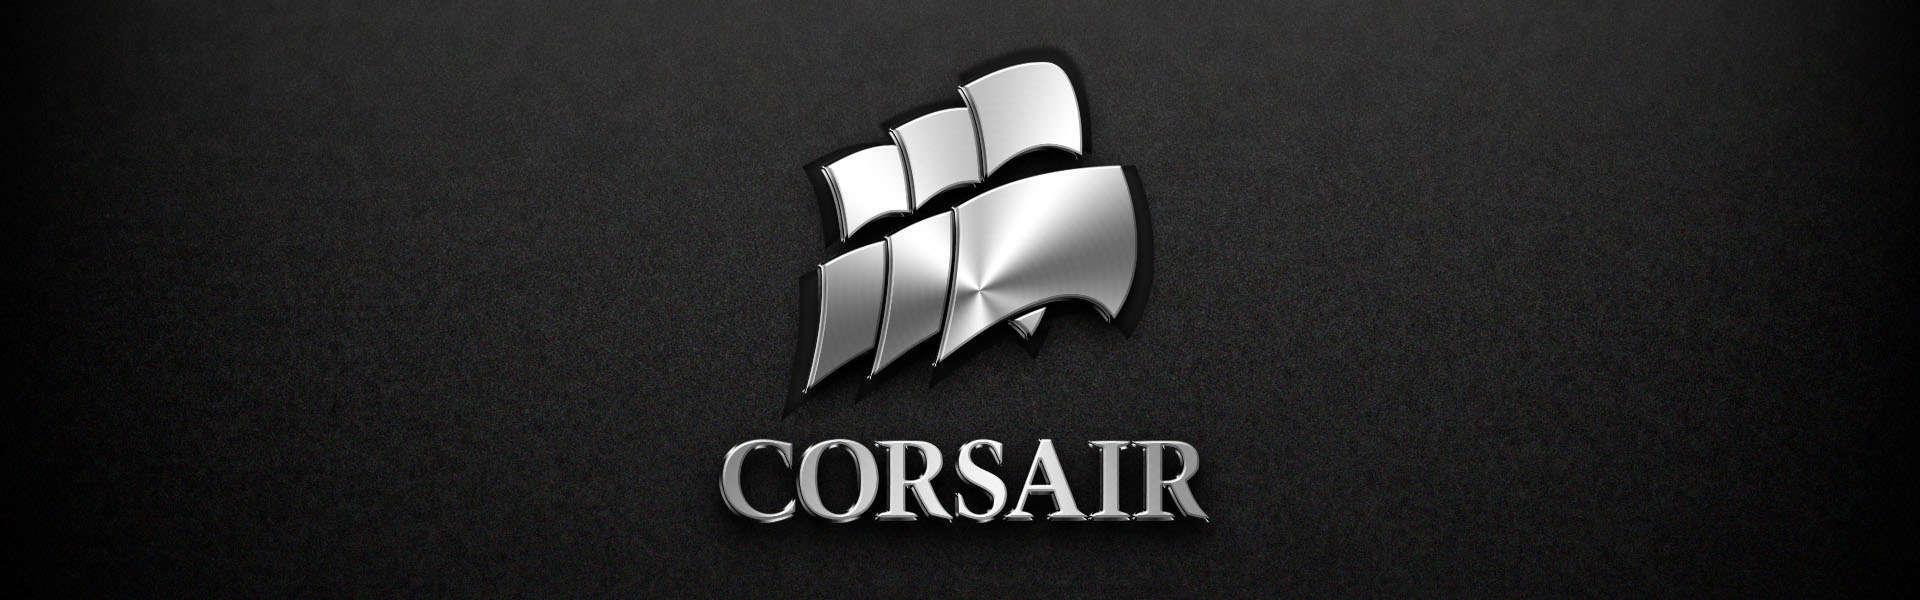 Corsair T2 Road Warrior Review